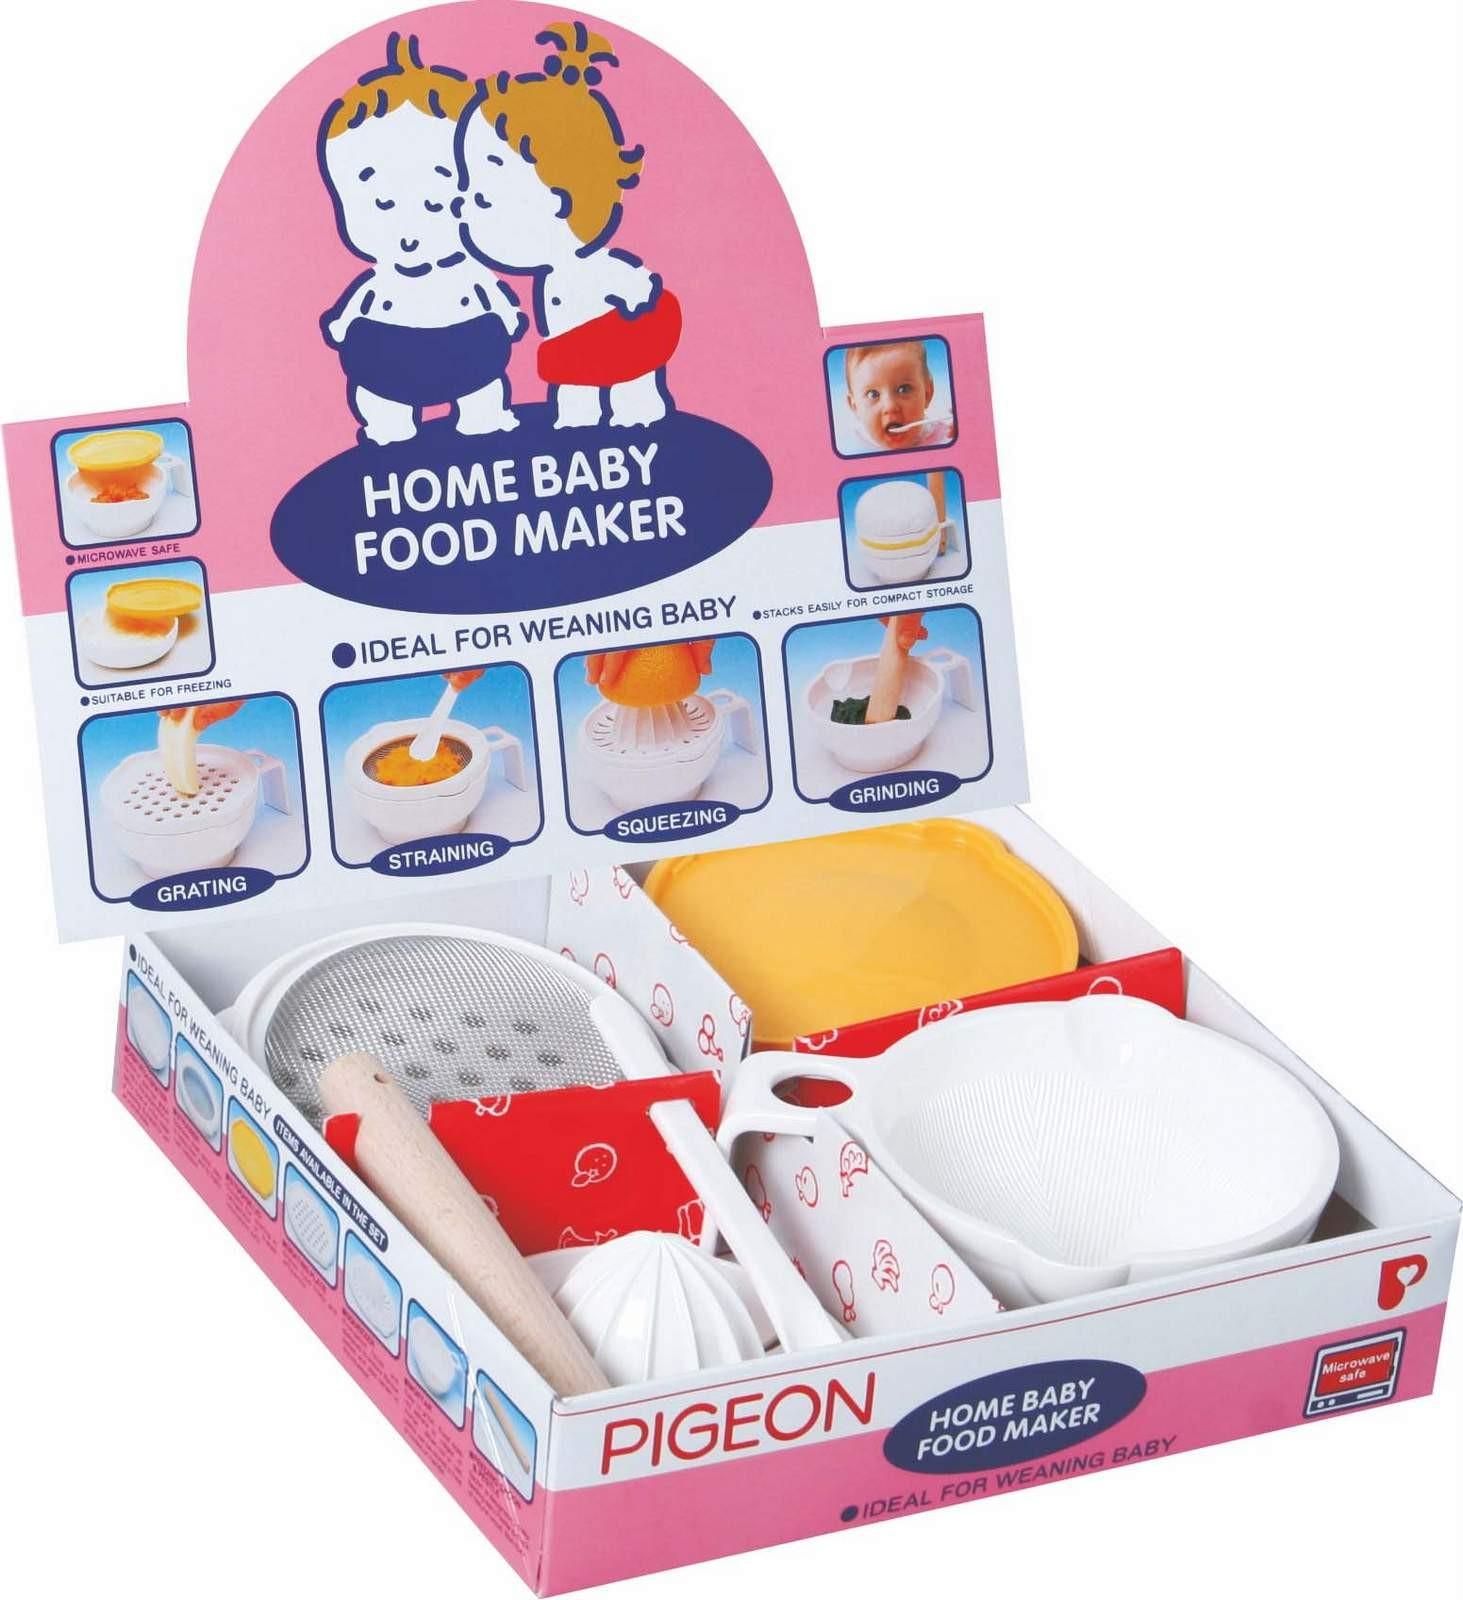 Leny Dewi Peralatan Perang Mpasi Homemade Baby Food Maker Pembuat Makan Bubur Saring Bayi Dalam Satu Set Itu Ada Tempat Makanan Memeras Buah Memarut Dan Menggerus